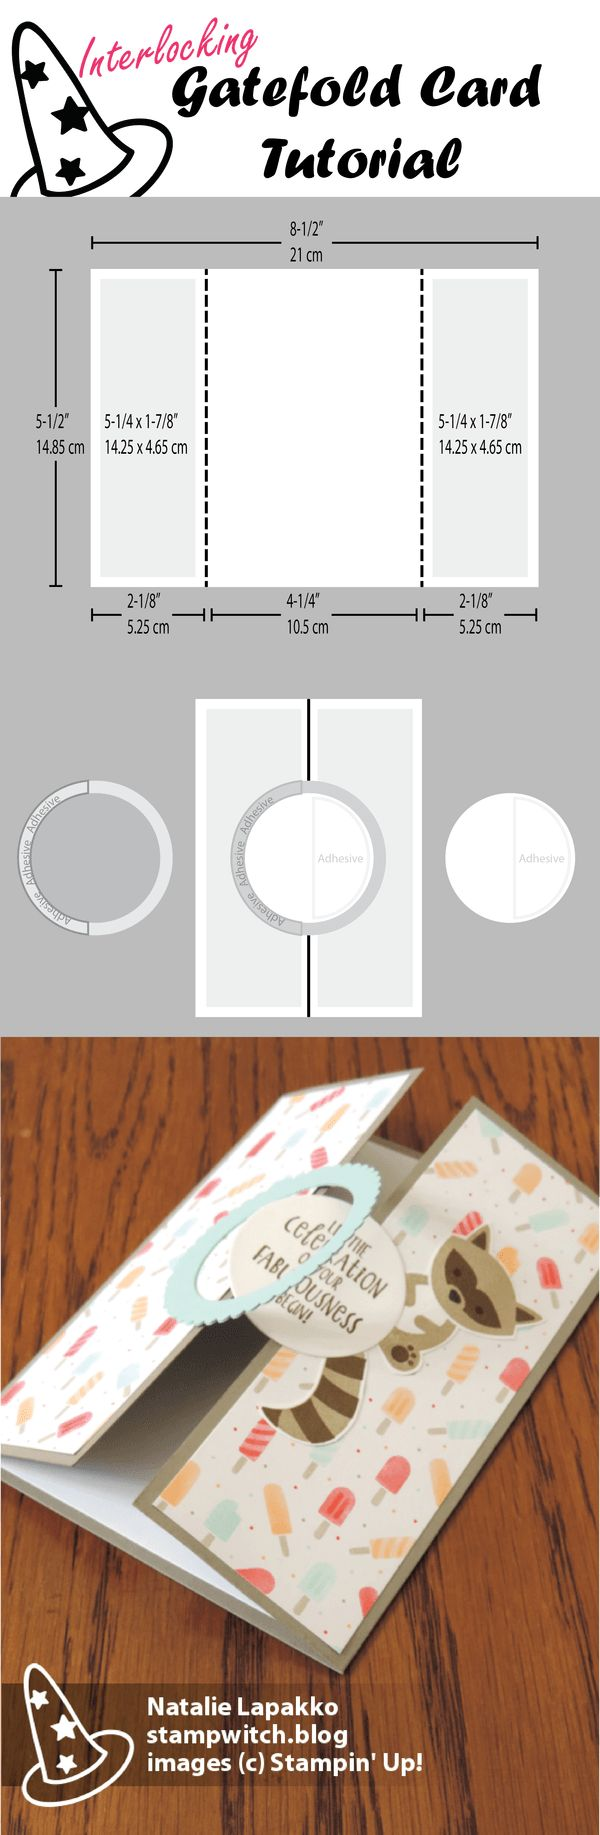 Interlocking gatefold carte tutoriel par Natalie Lapakko avec Foxy Amis timbres et Tasty Treats DSP de Stampin 'Up!